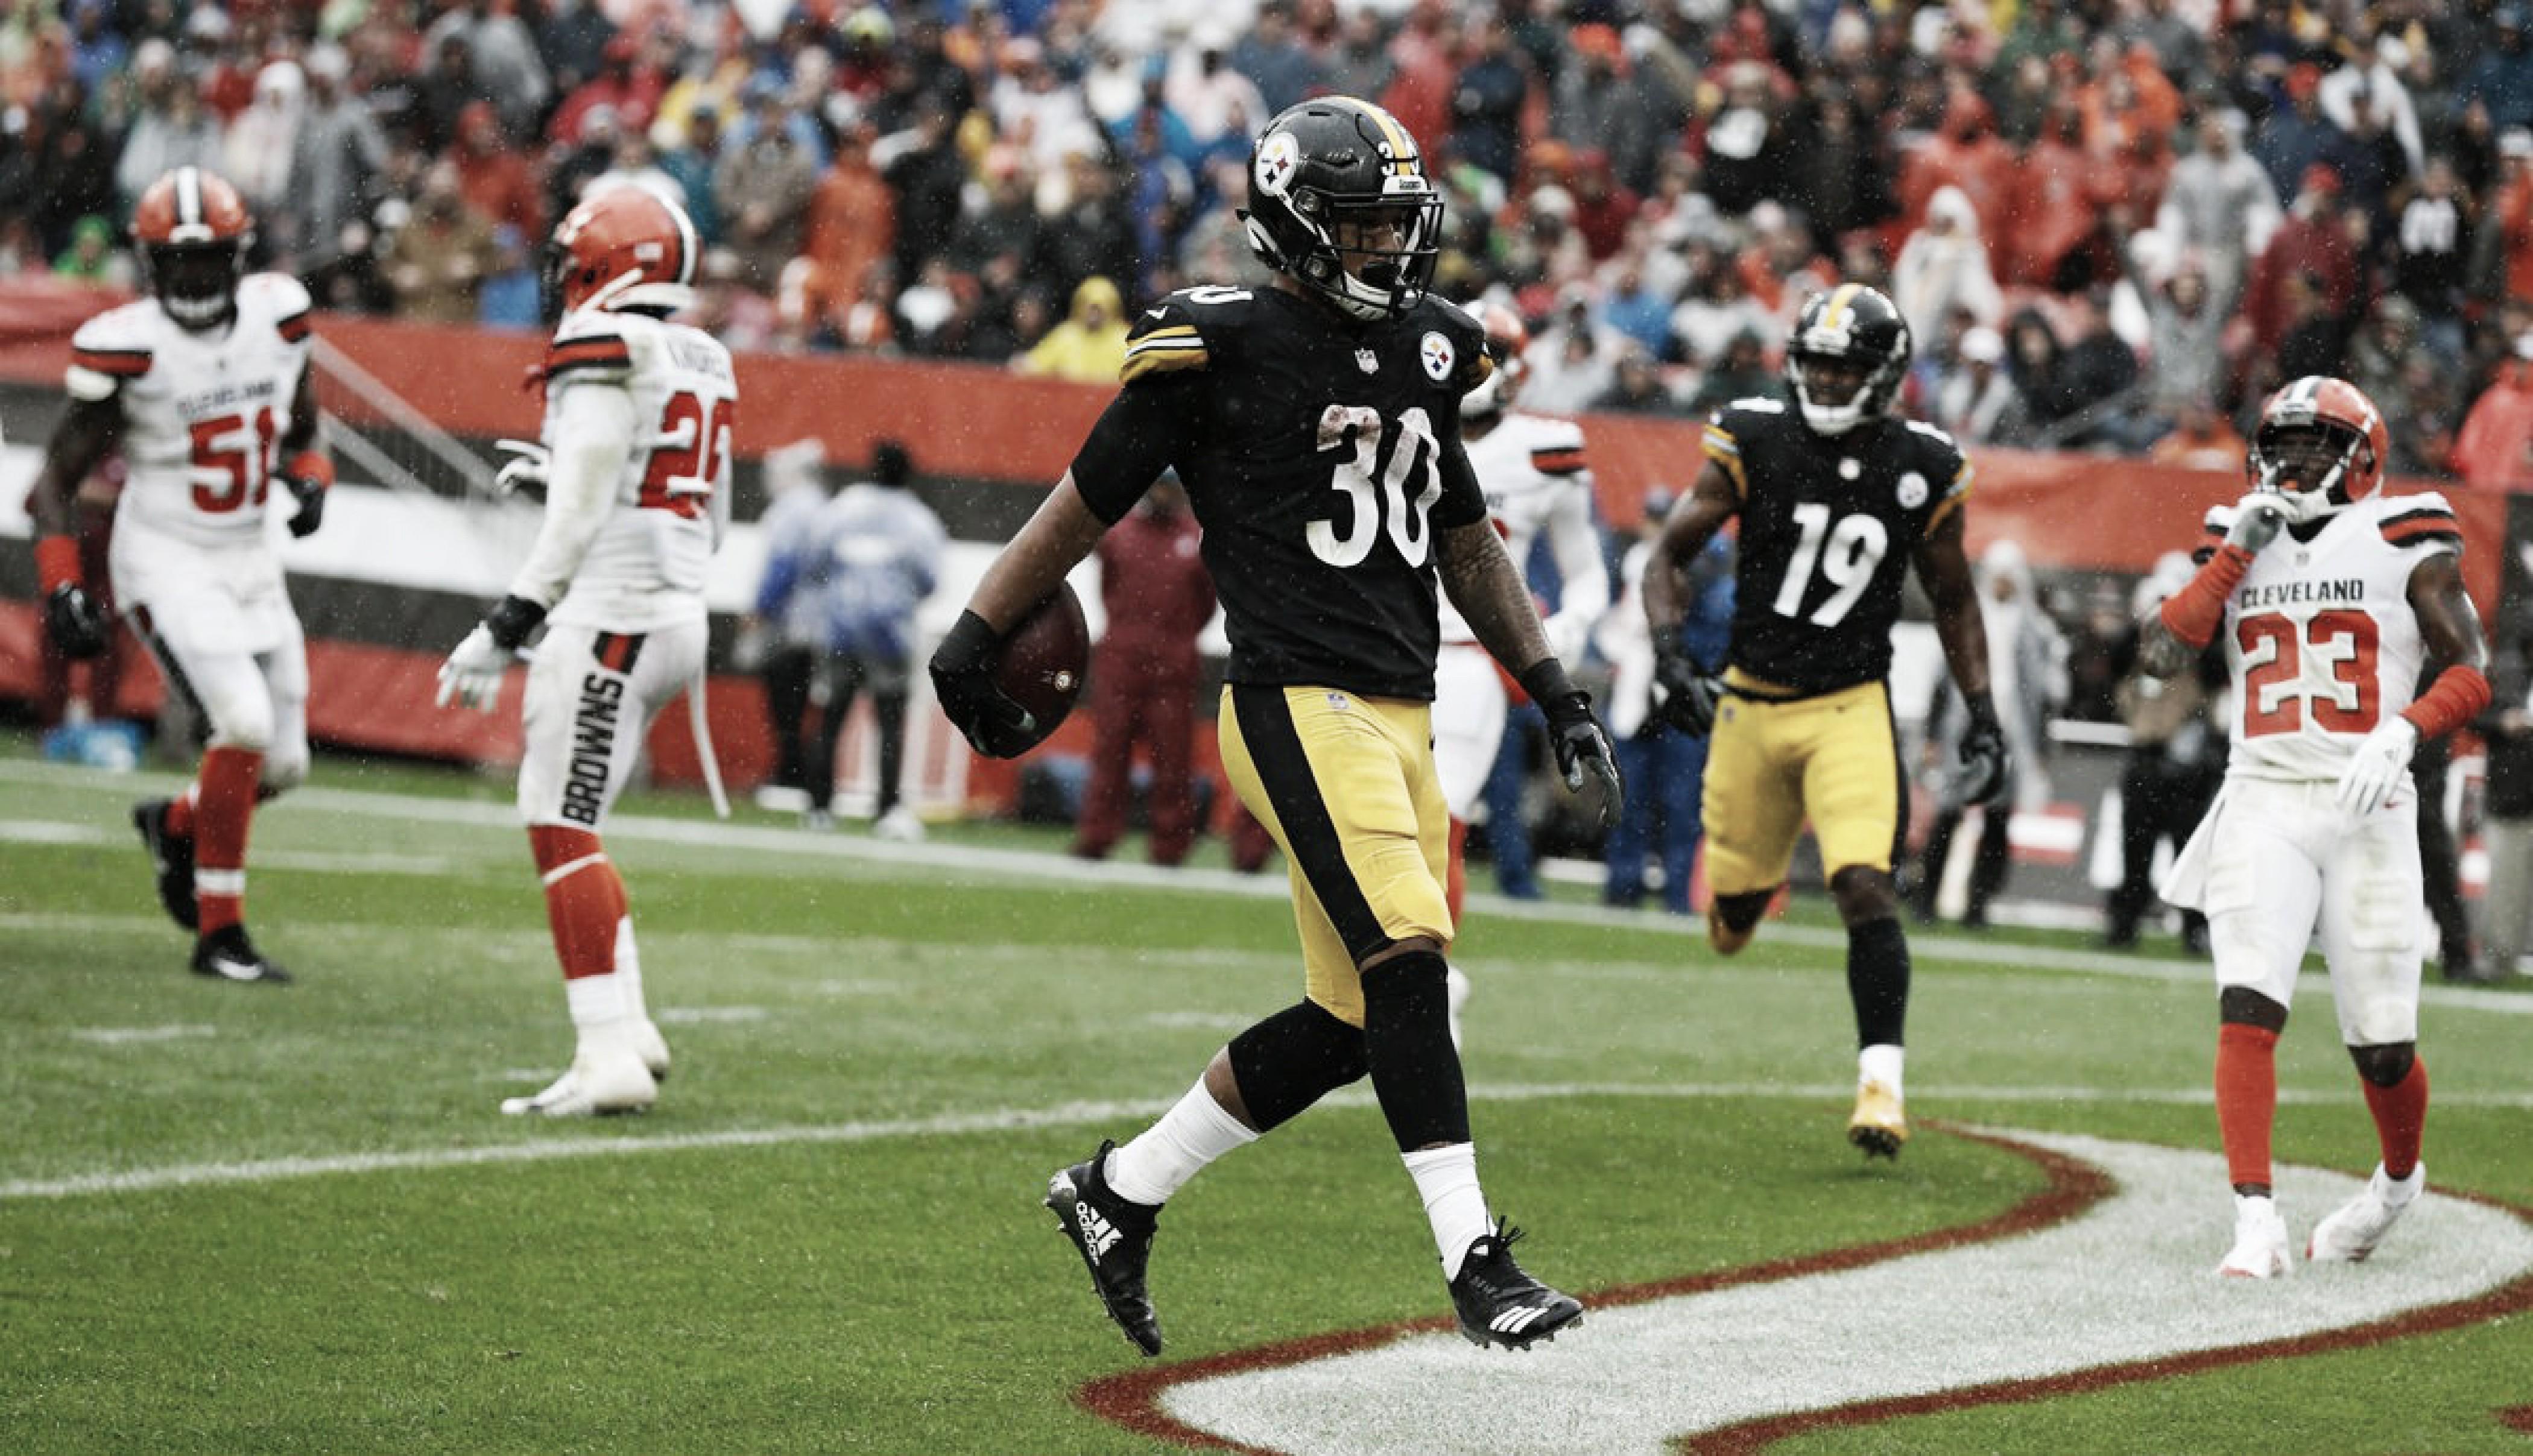 Steelers y Browns empatan en la semana inaugural